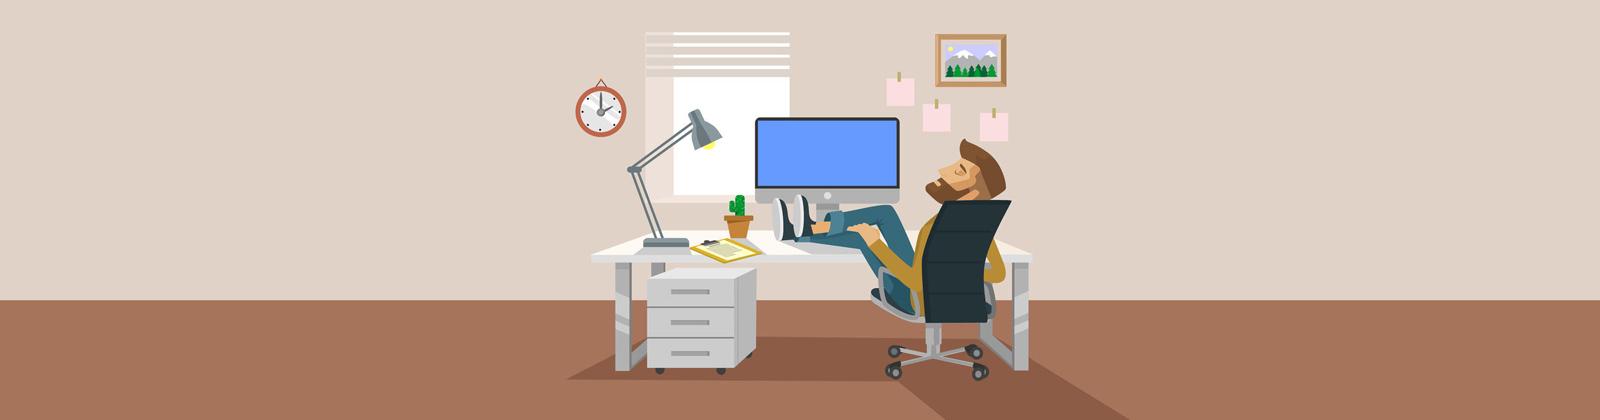 diventare freelance slide 1